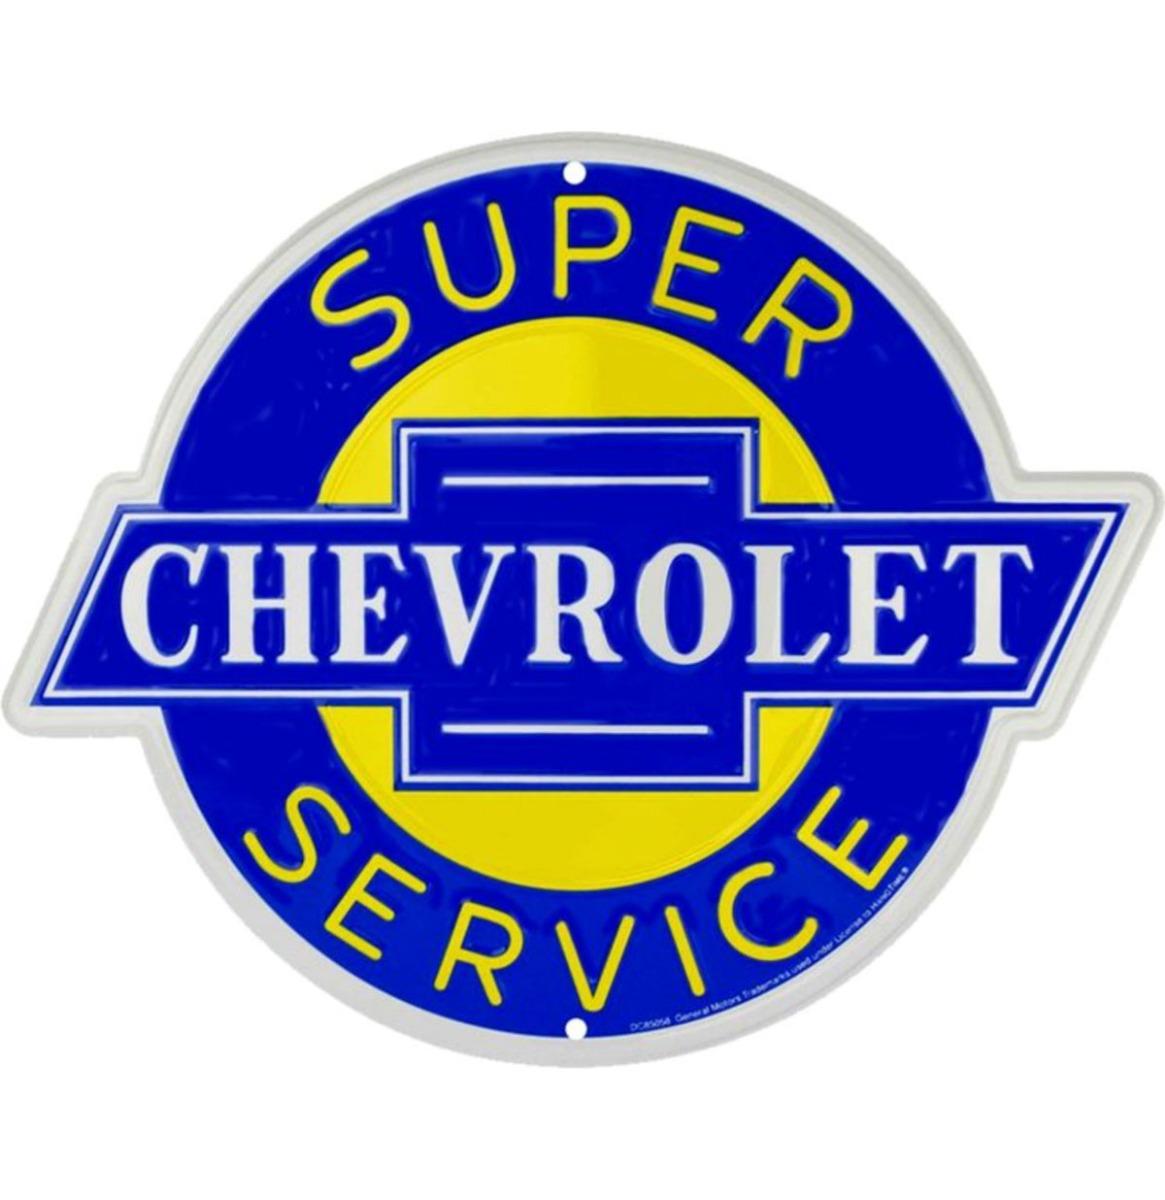 Chevrolet Chevy Super Service Metalen Bord 72 x 58 cm